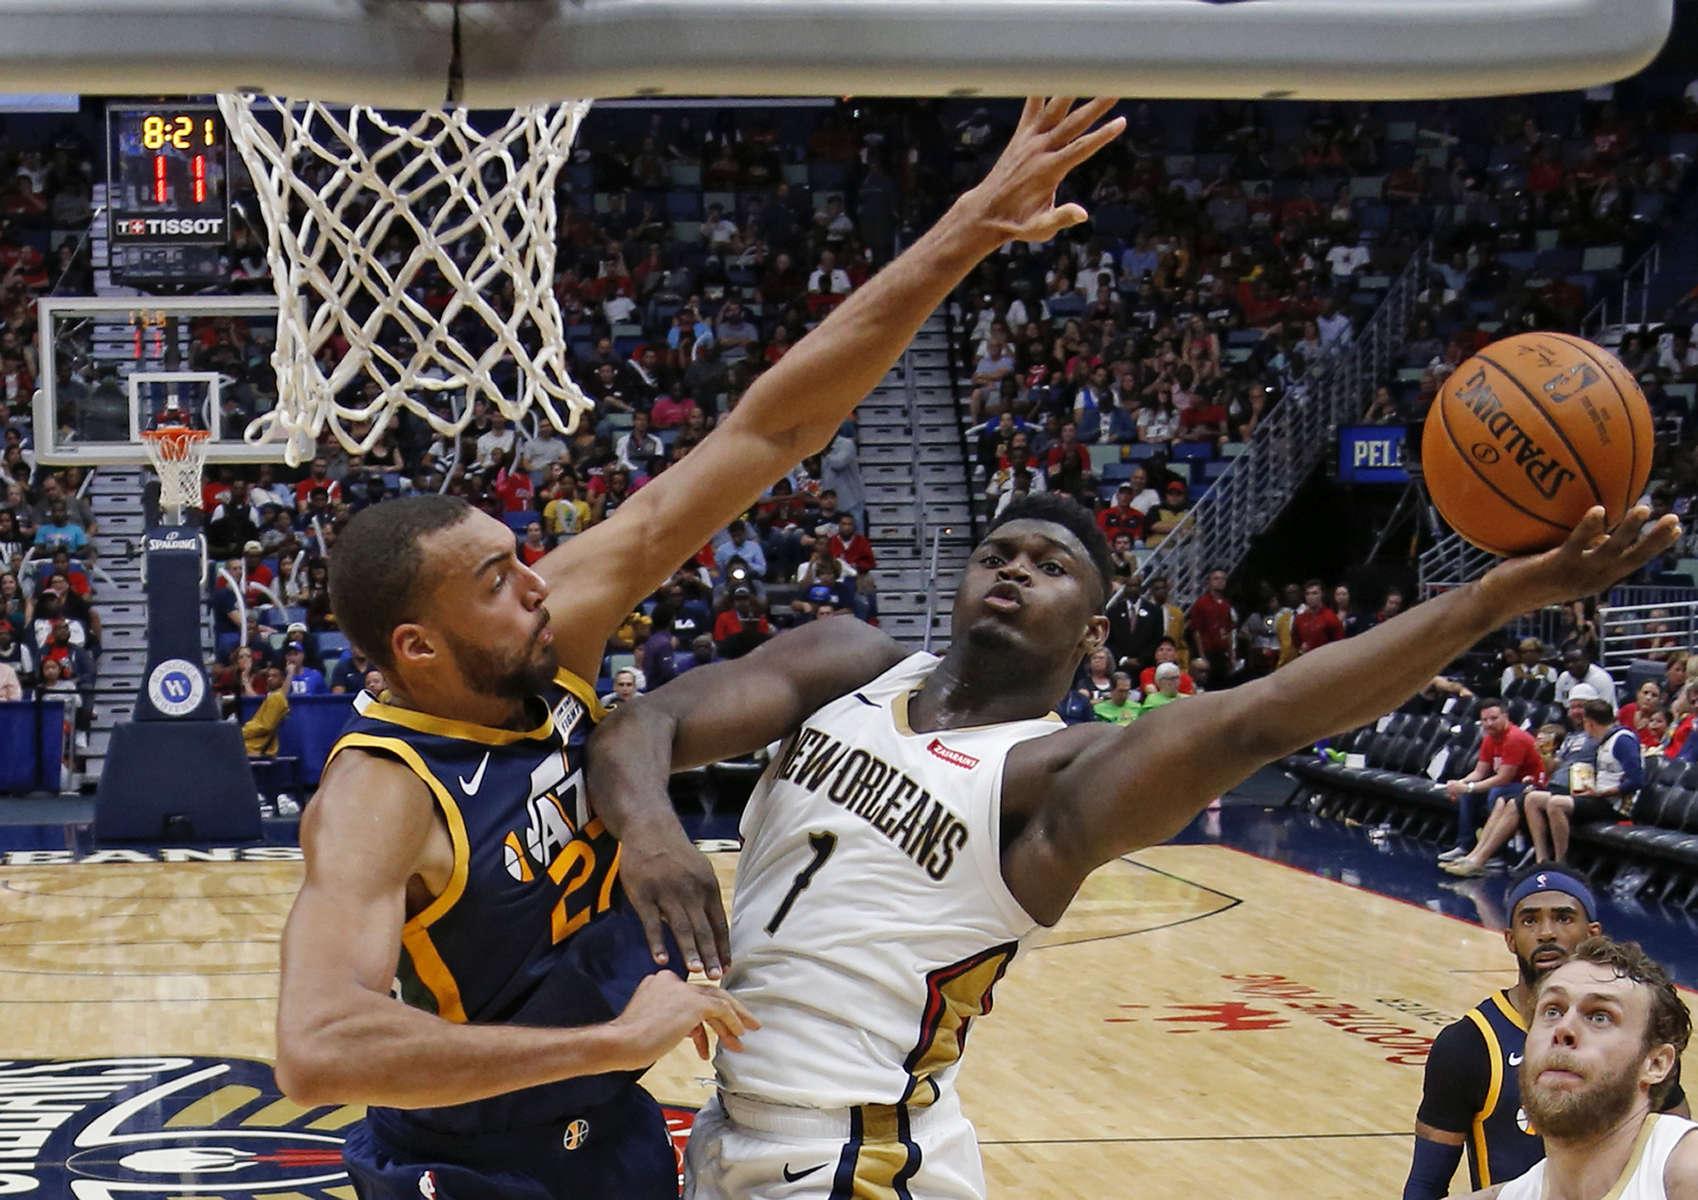 New Orleans Pelicans forward Zion Williamson (1) makes a layup against Utah Jazz center Rudy Gobert (27) during the second half an NBA preseason basketball game in New Orleans, Friday, Oct. 11, 2019. The Pelicans won 128-127.